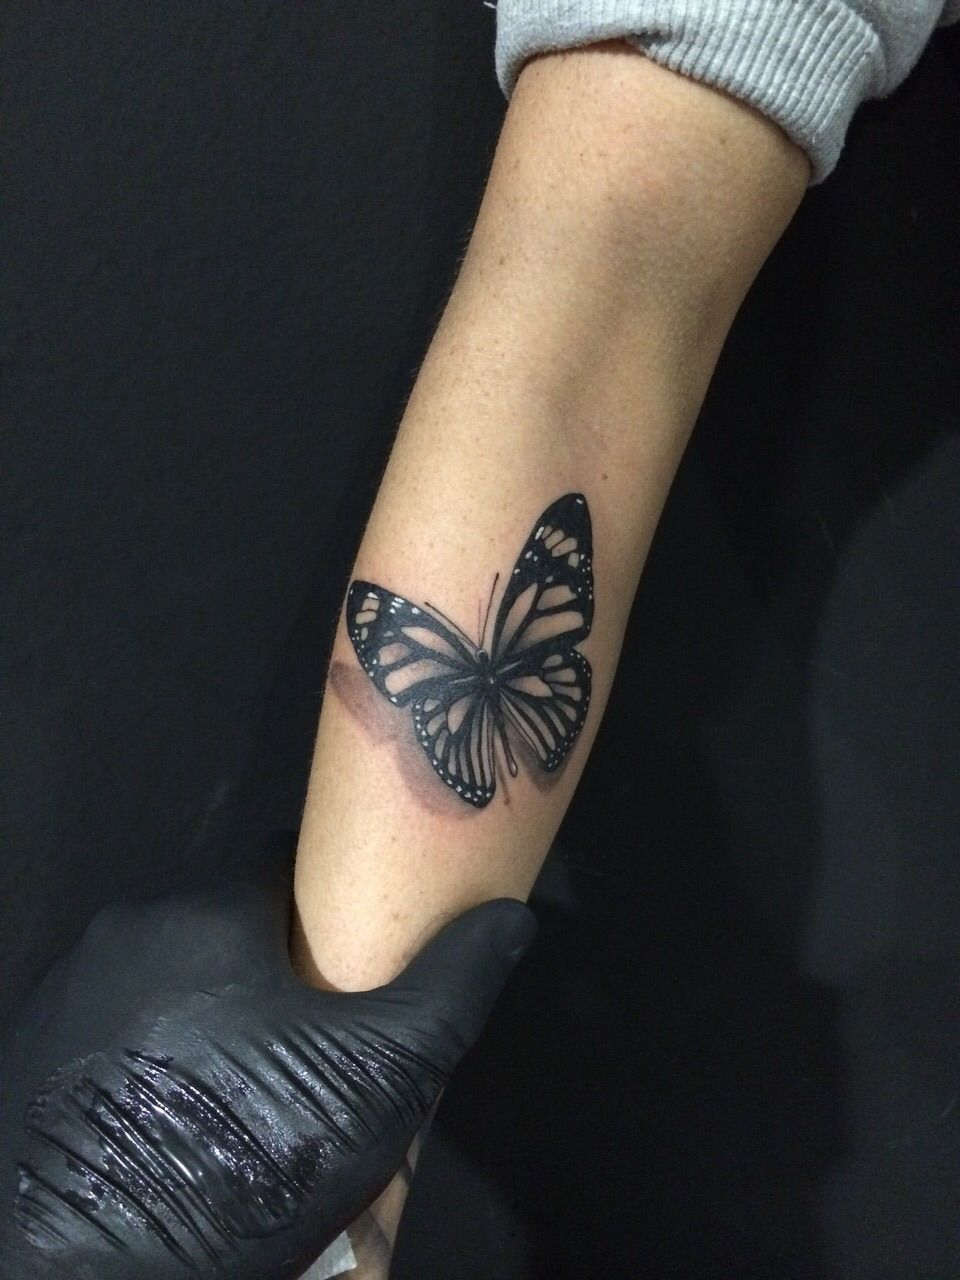 tattoos butterfly on forearm - Google-Suche   Tattoo   Pinterest ... - Tattoo Unterarm Klein